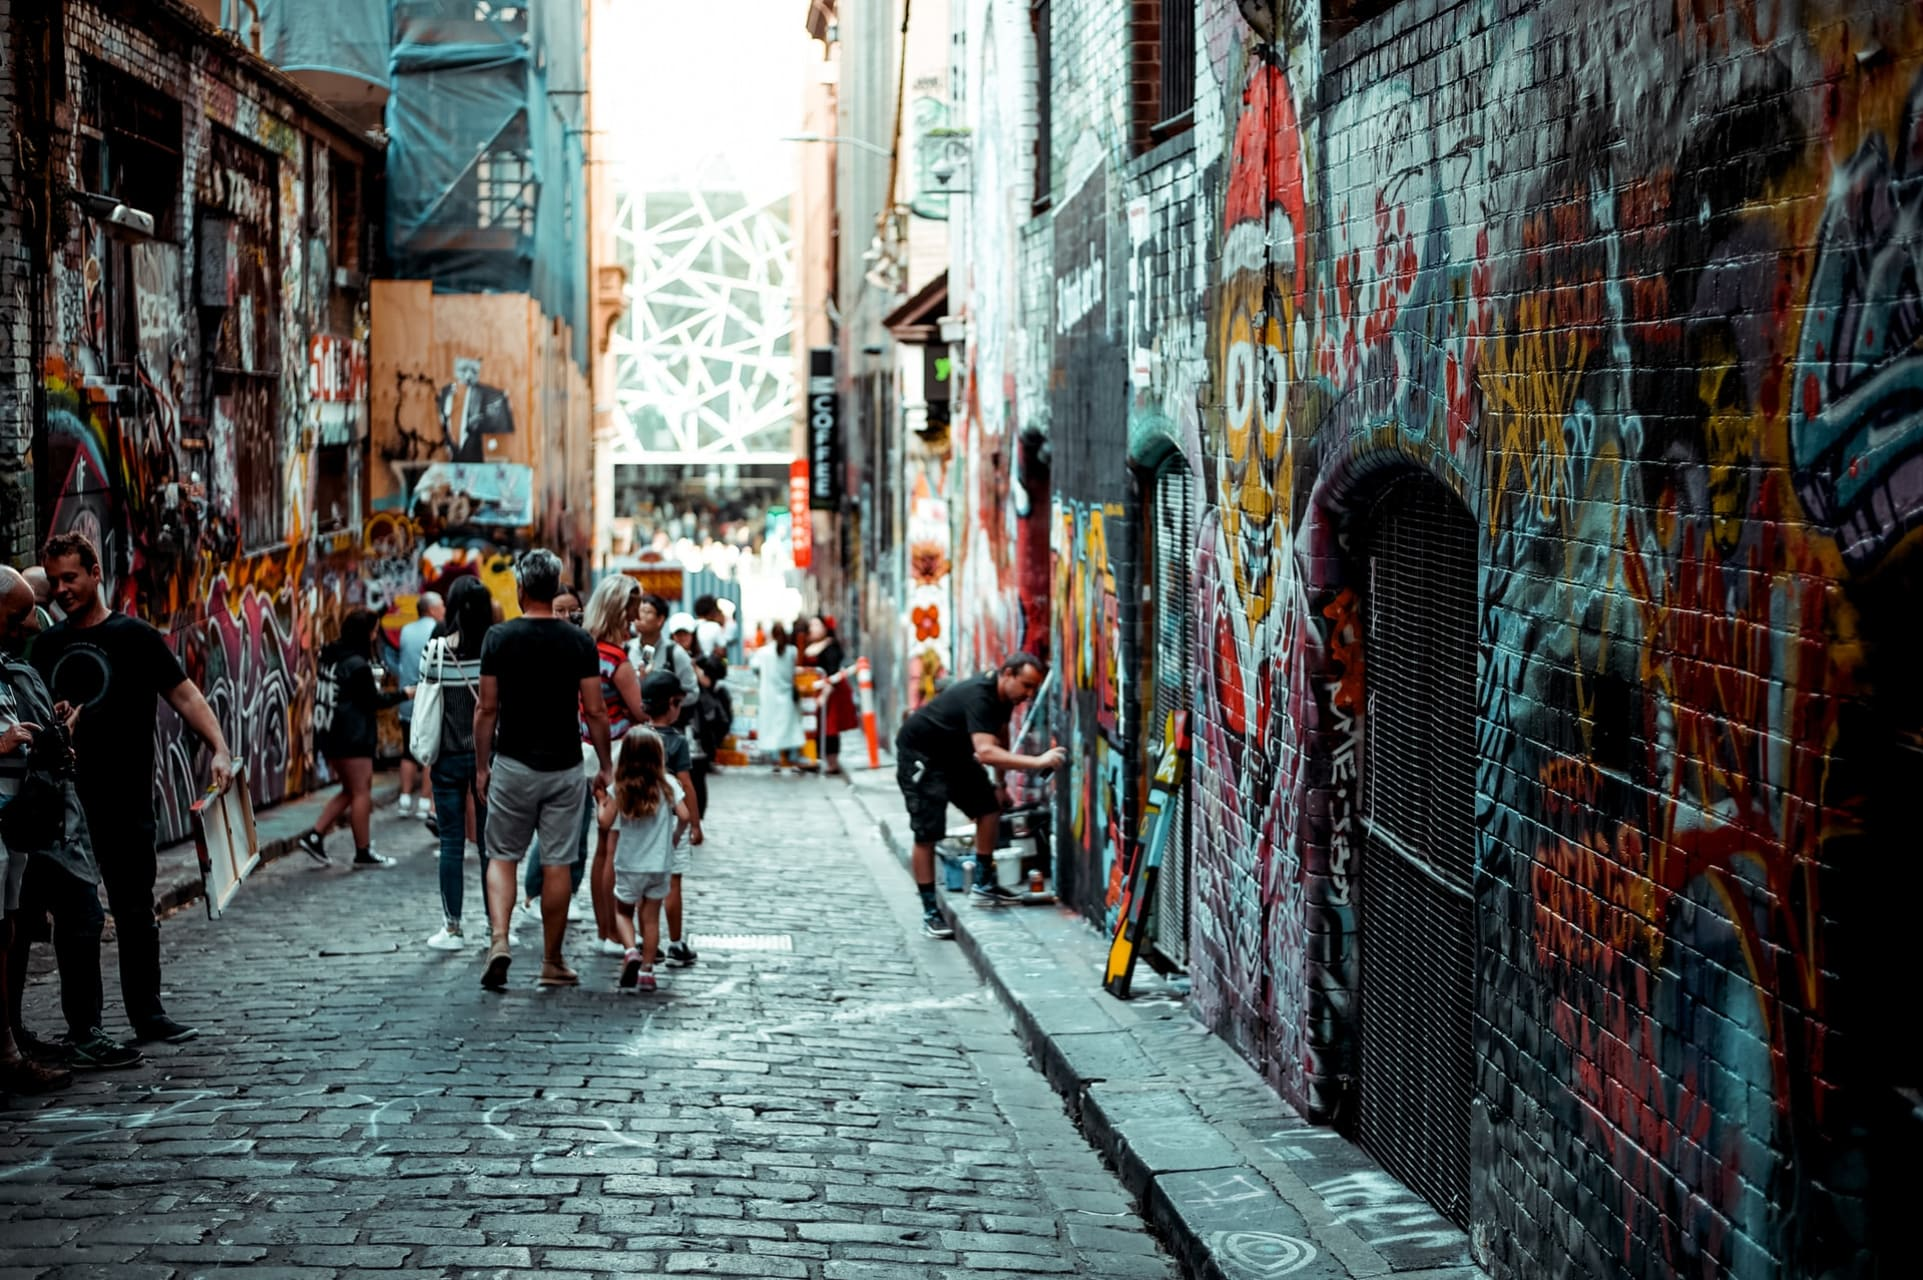 Melbourne - Discover Melbourne's Secret Laneways and Alleys